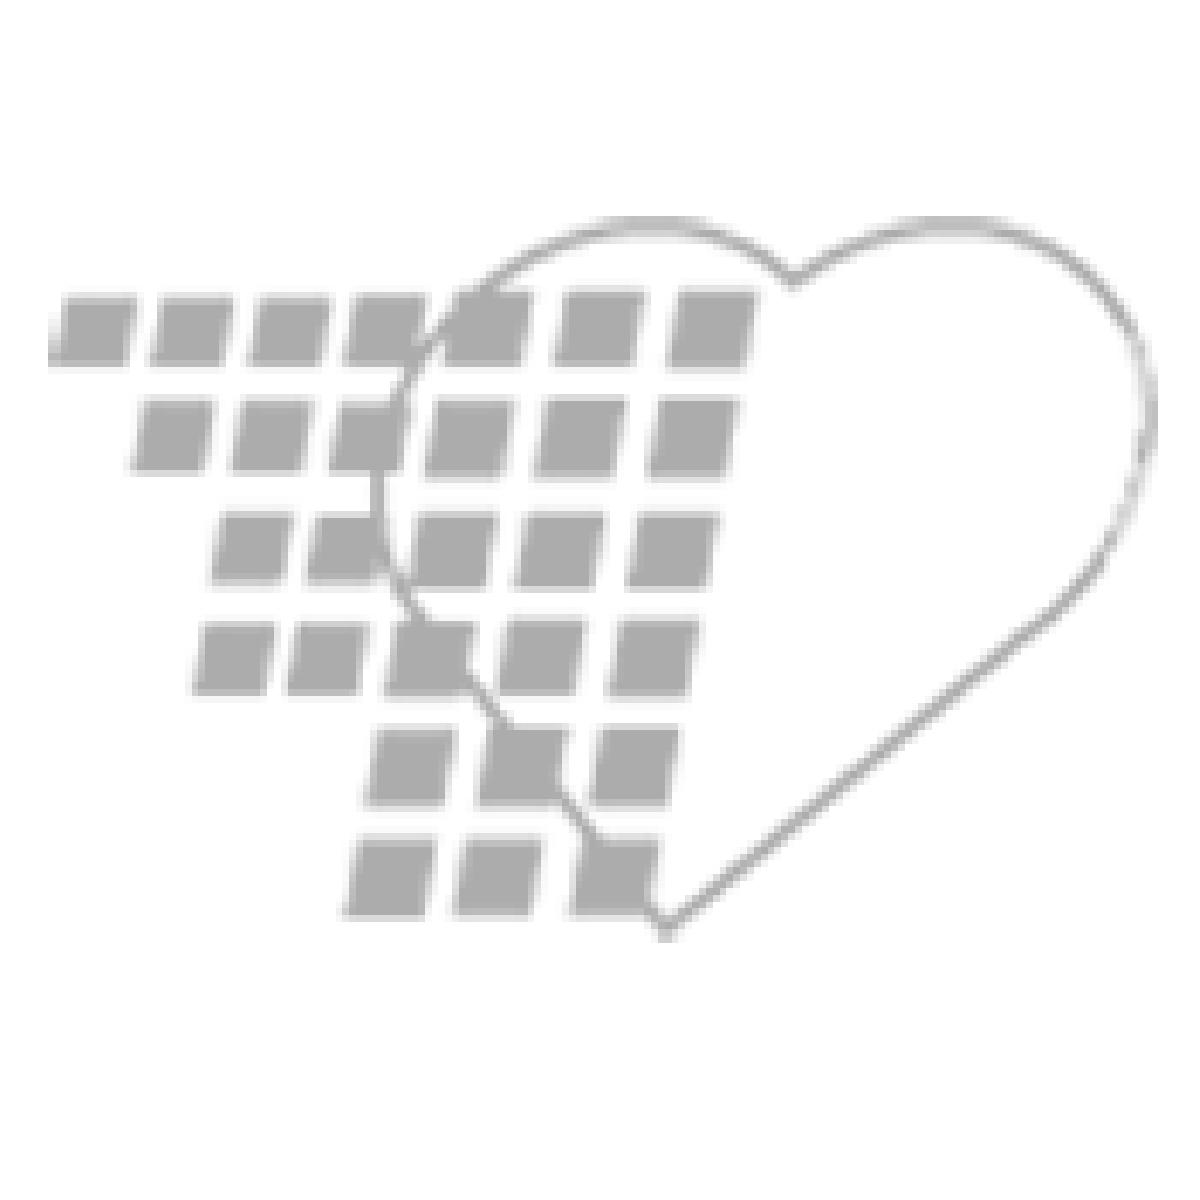 11-94-0151 Laerdal Integrating SimPad at Customer Site